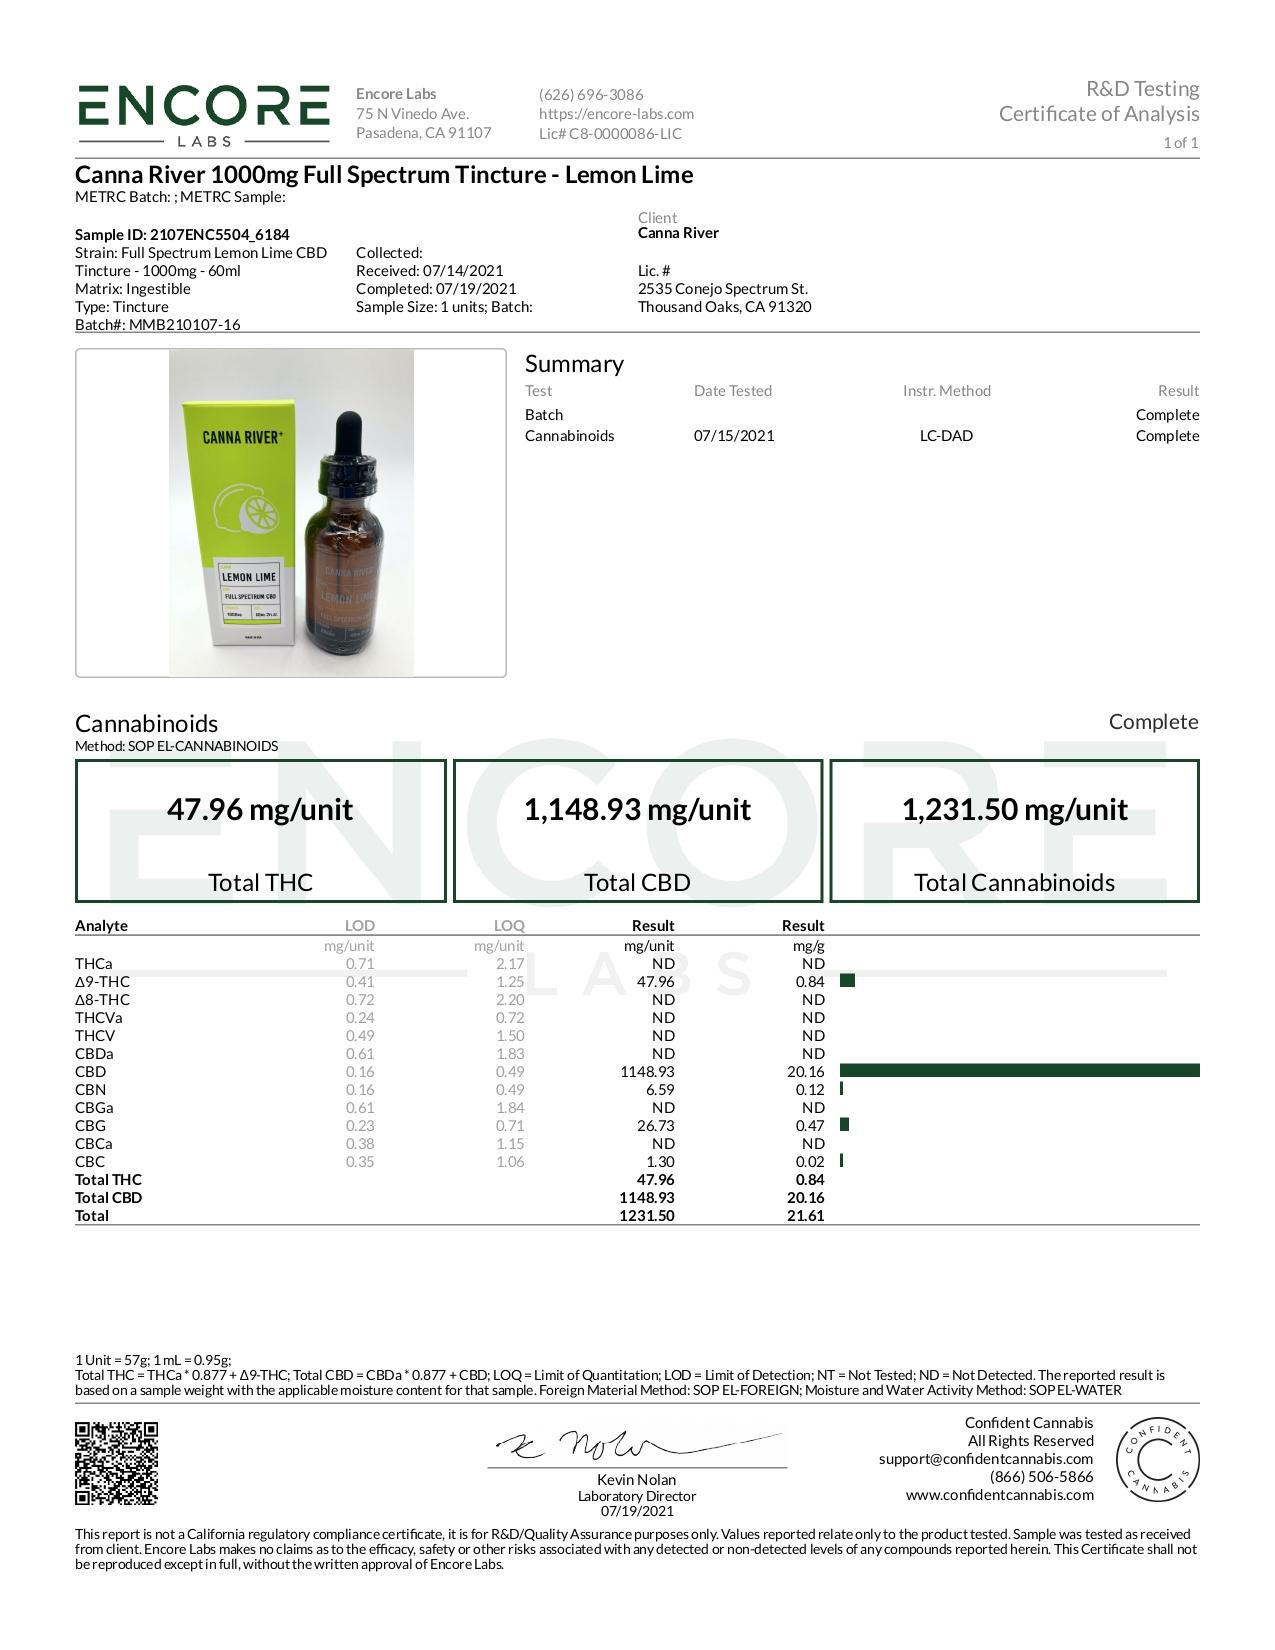 Canna River CBD Tincture Full Spectrum Lemon Lime Lab Report 1000mg